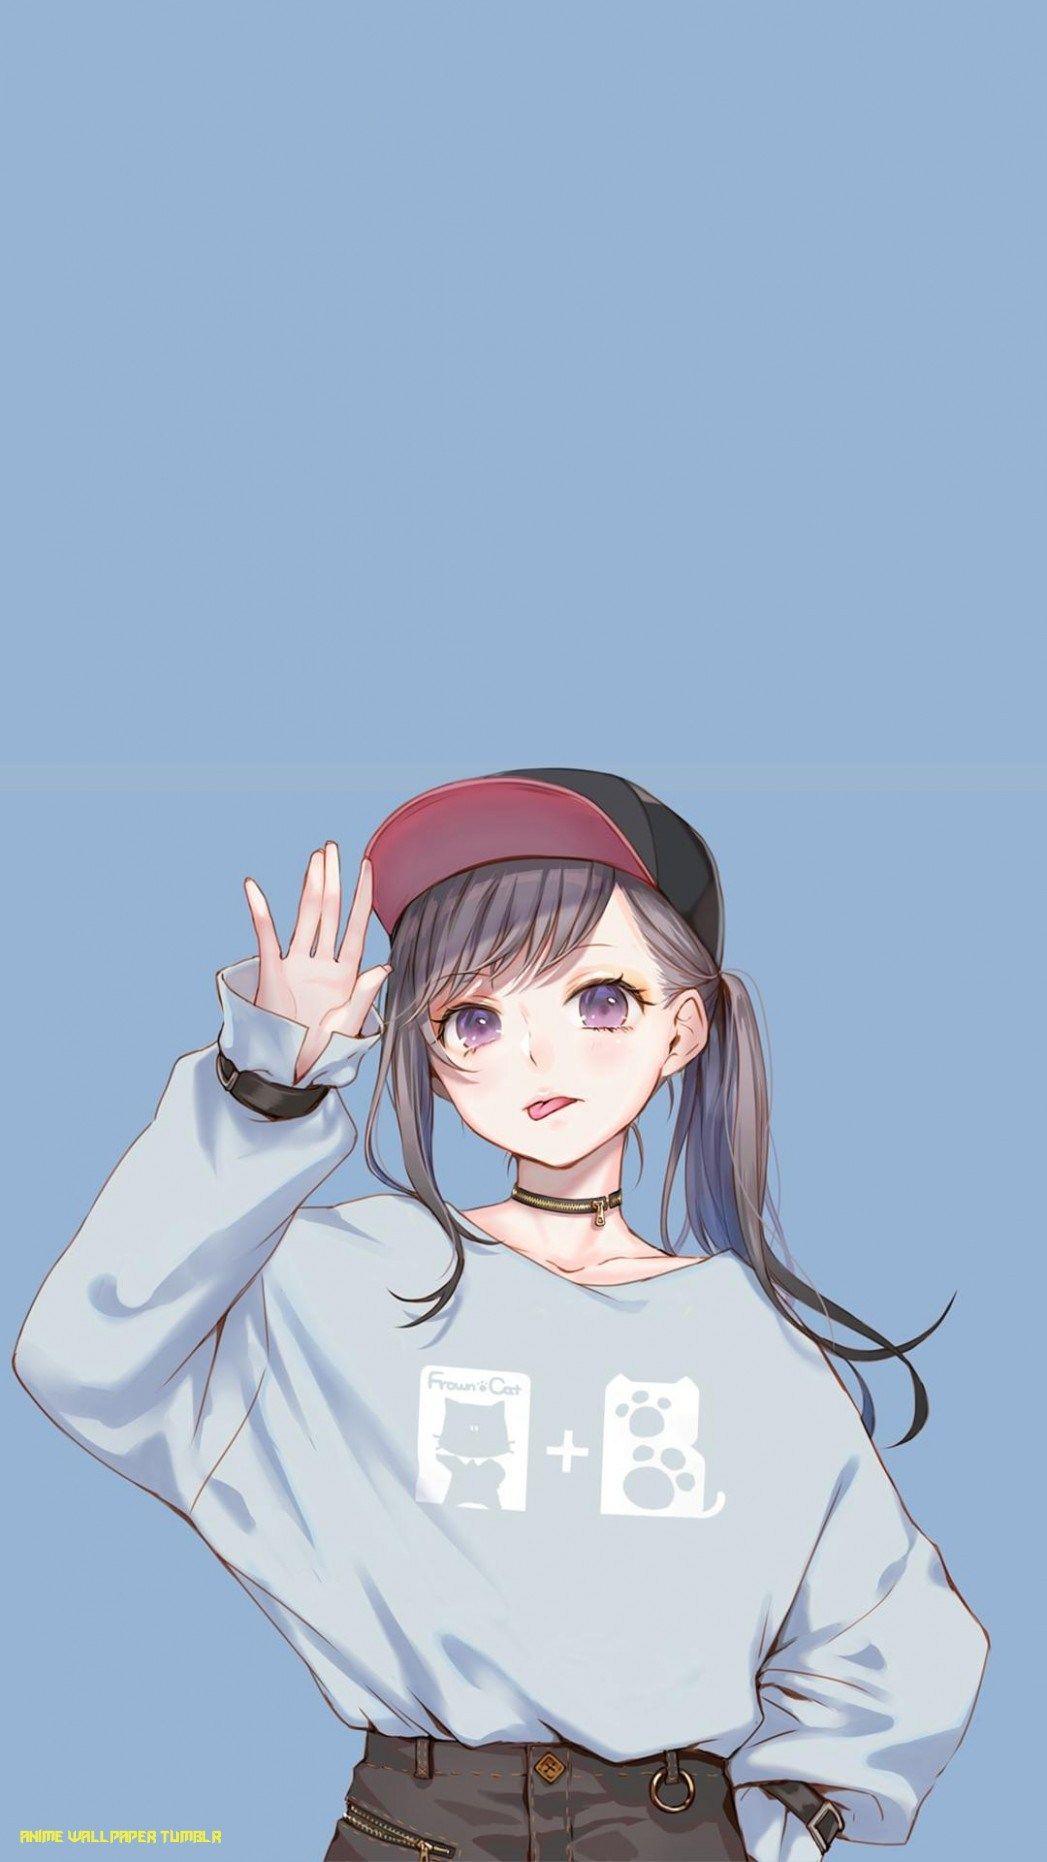 Anime Sad Girl Tumblr : anime, tumblr, Anime, Aesthetic, Wallpaper, Iphone, Tumblr